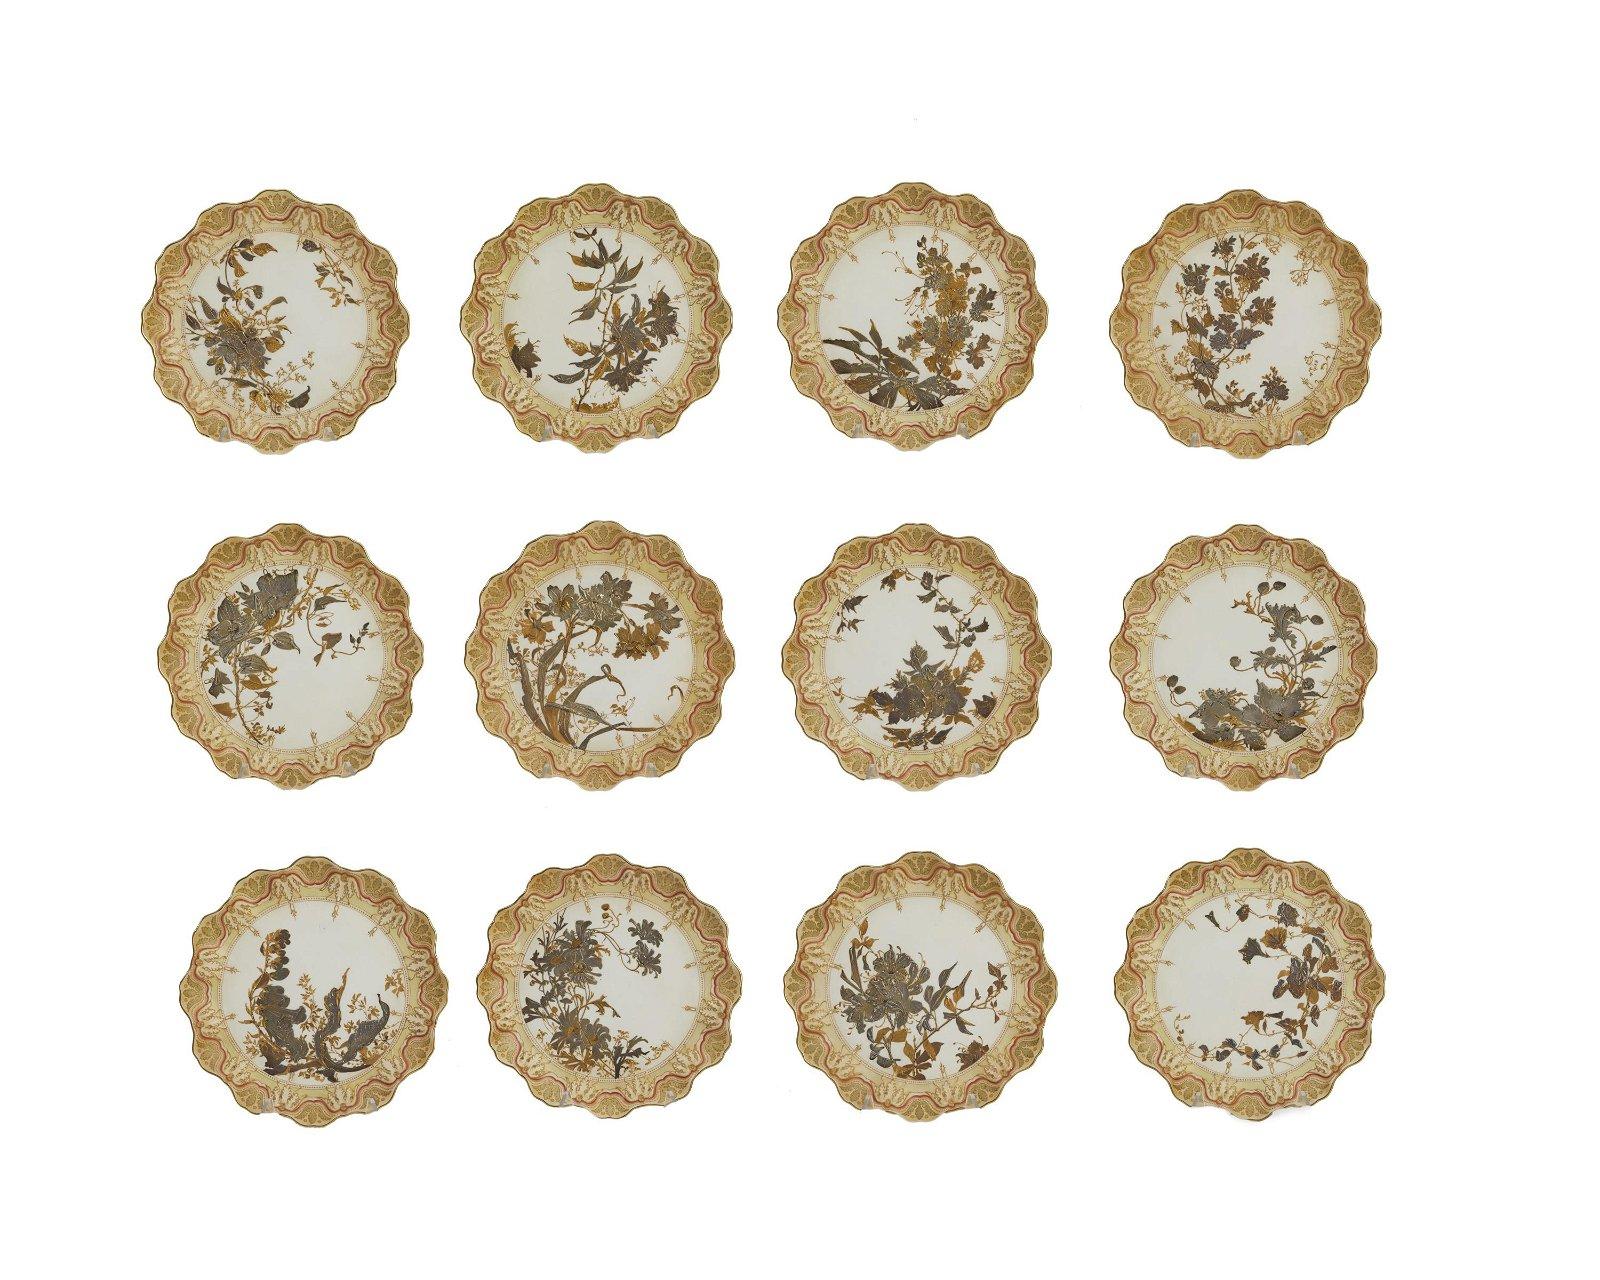 Twelve Royal Doulton luncheon plates